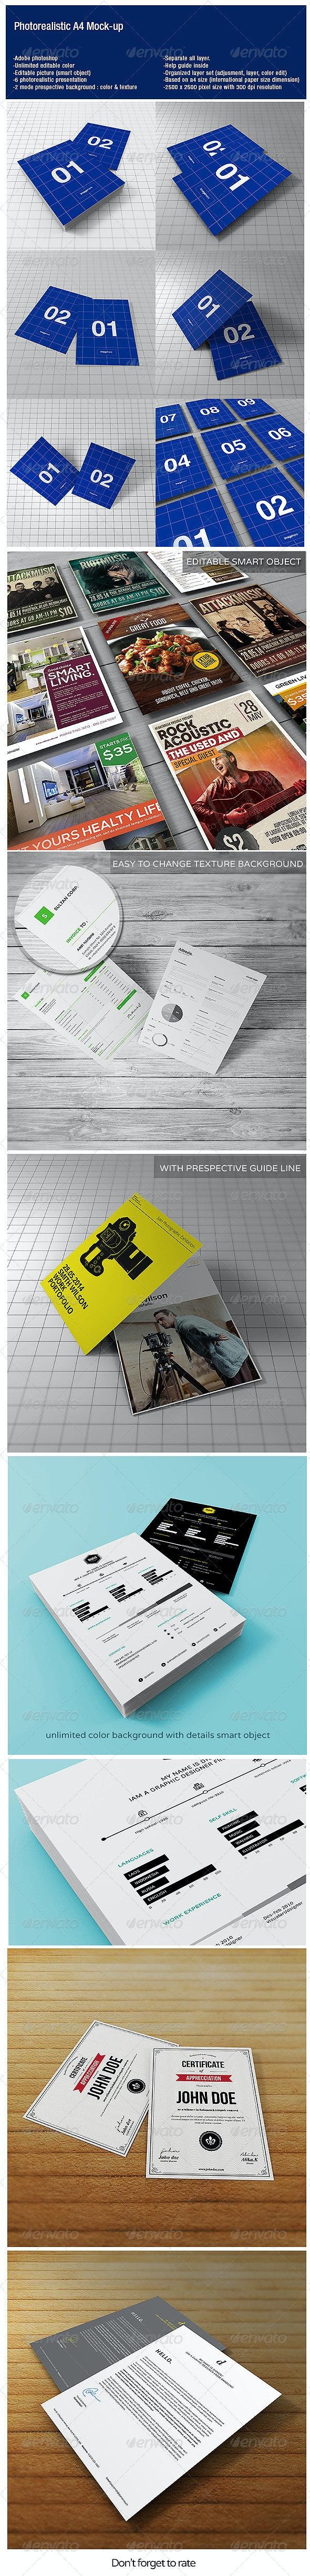 A4 Photorealistic Mock-up - Flyers Print